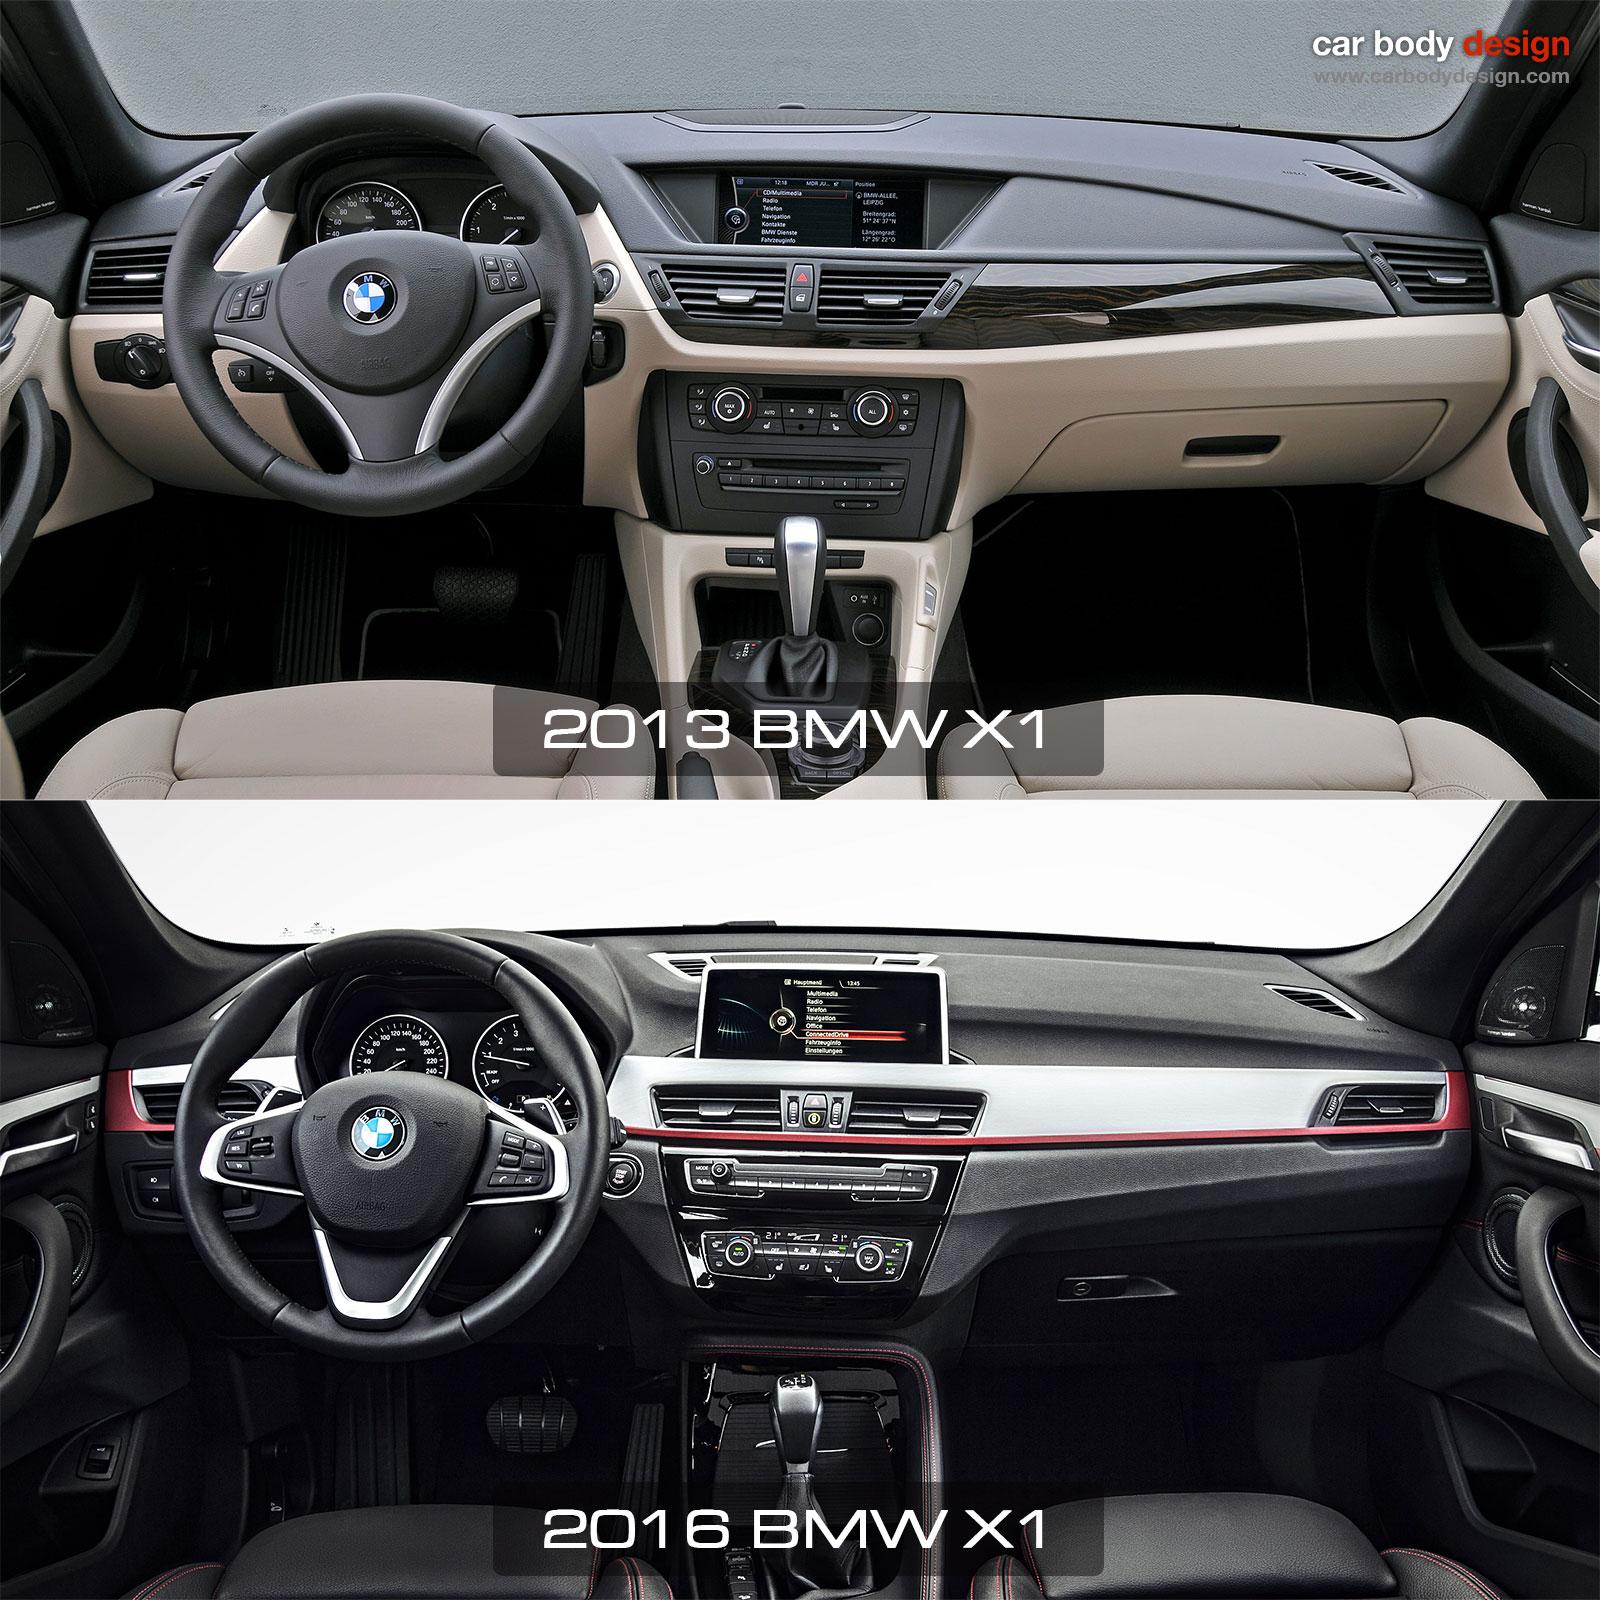 1st Vs 2nd Generation Bmw X1 Interior Design Comparison Car Body Design